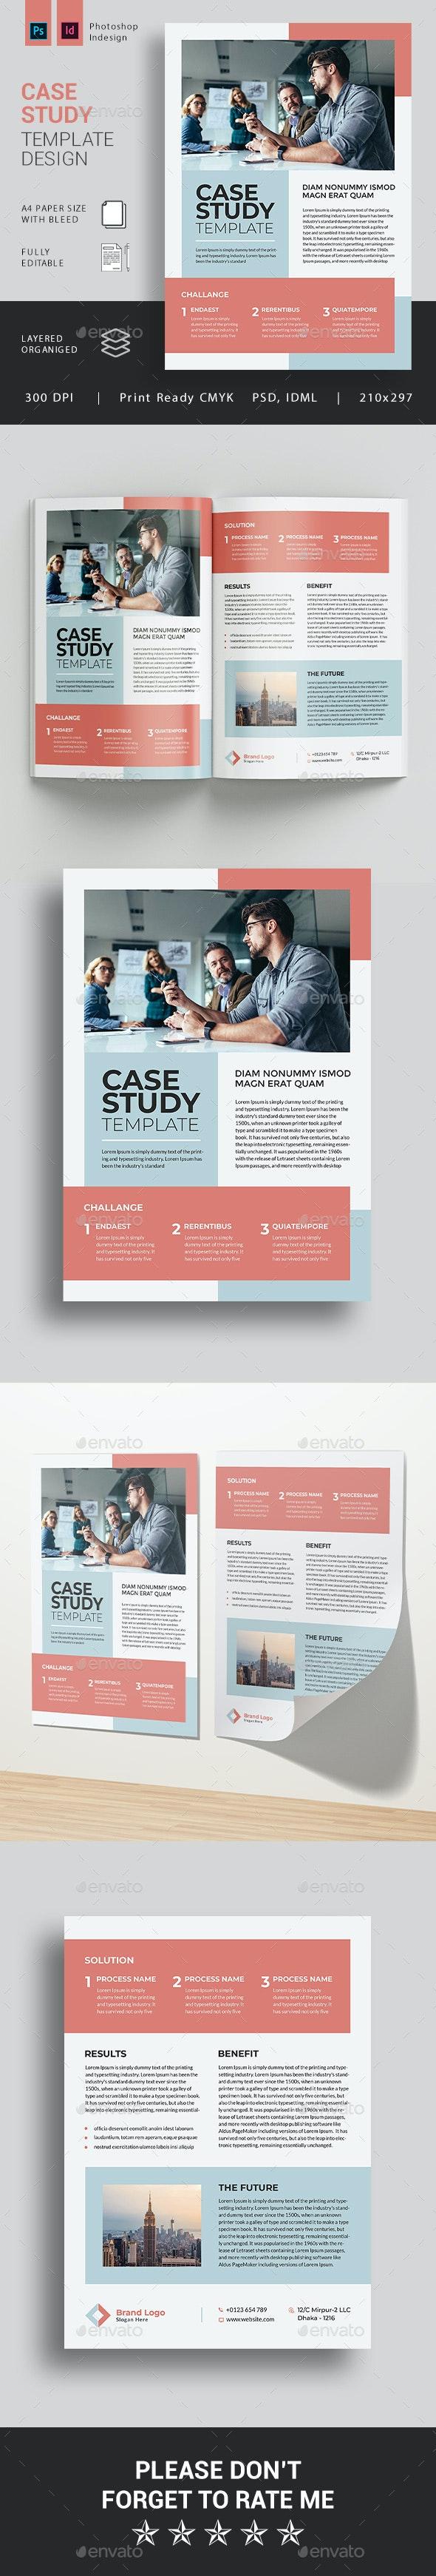 Case Study - Brochures Print Templates